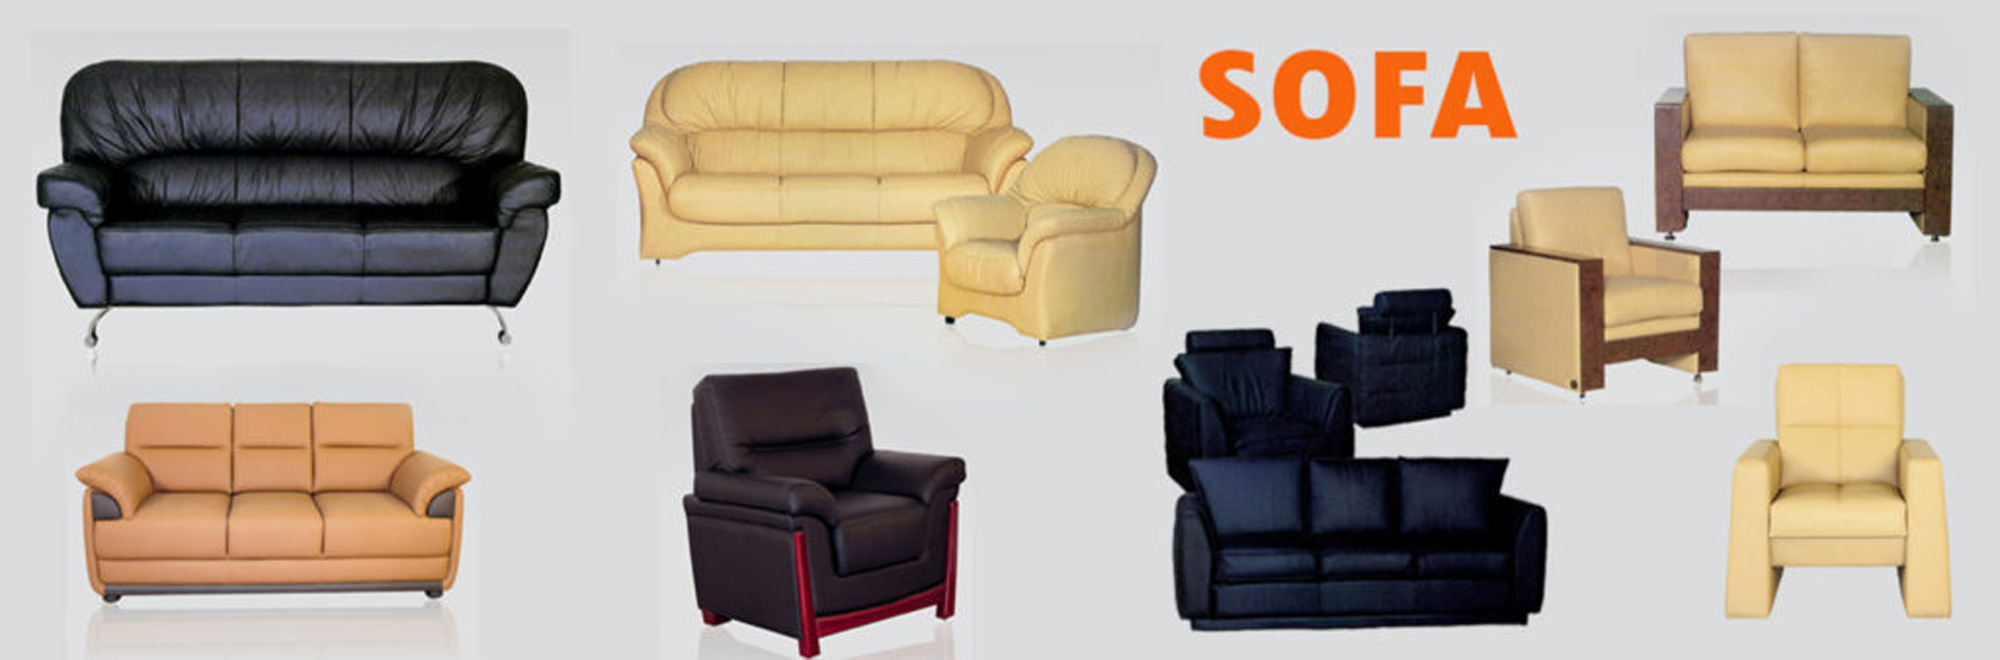 sofa qatar